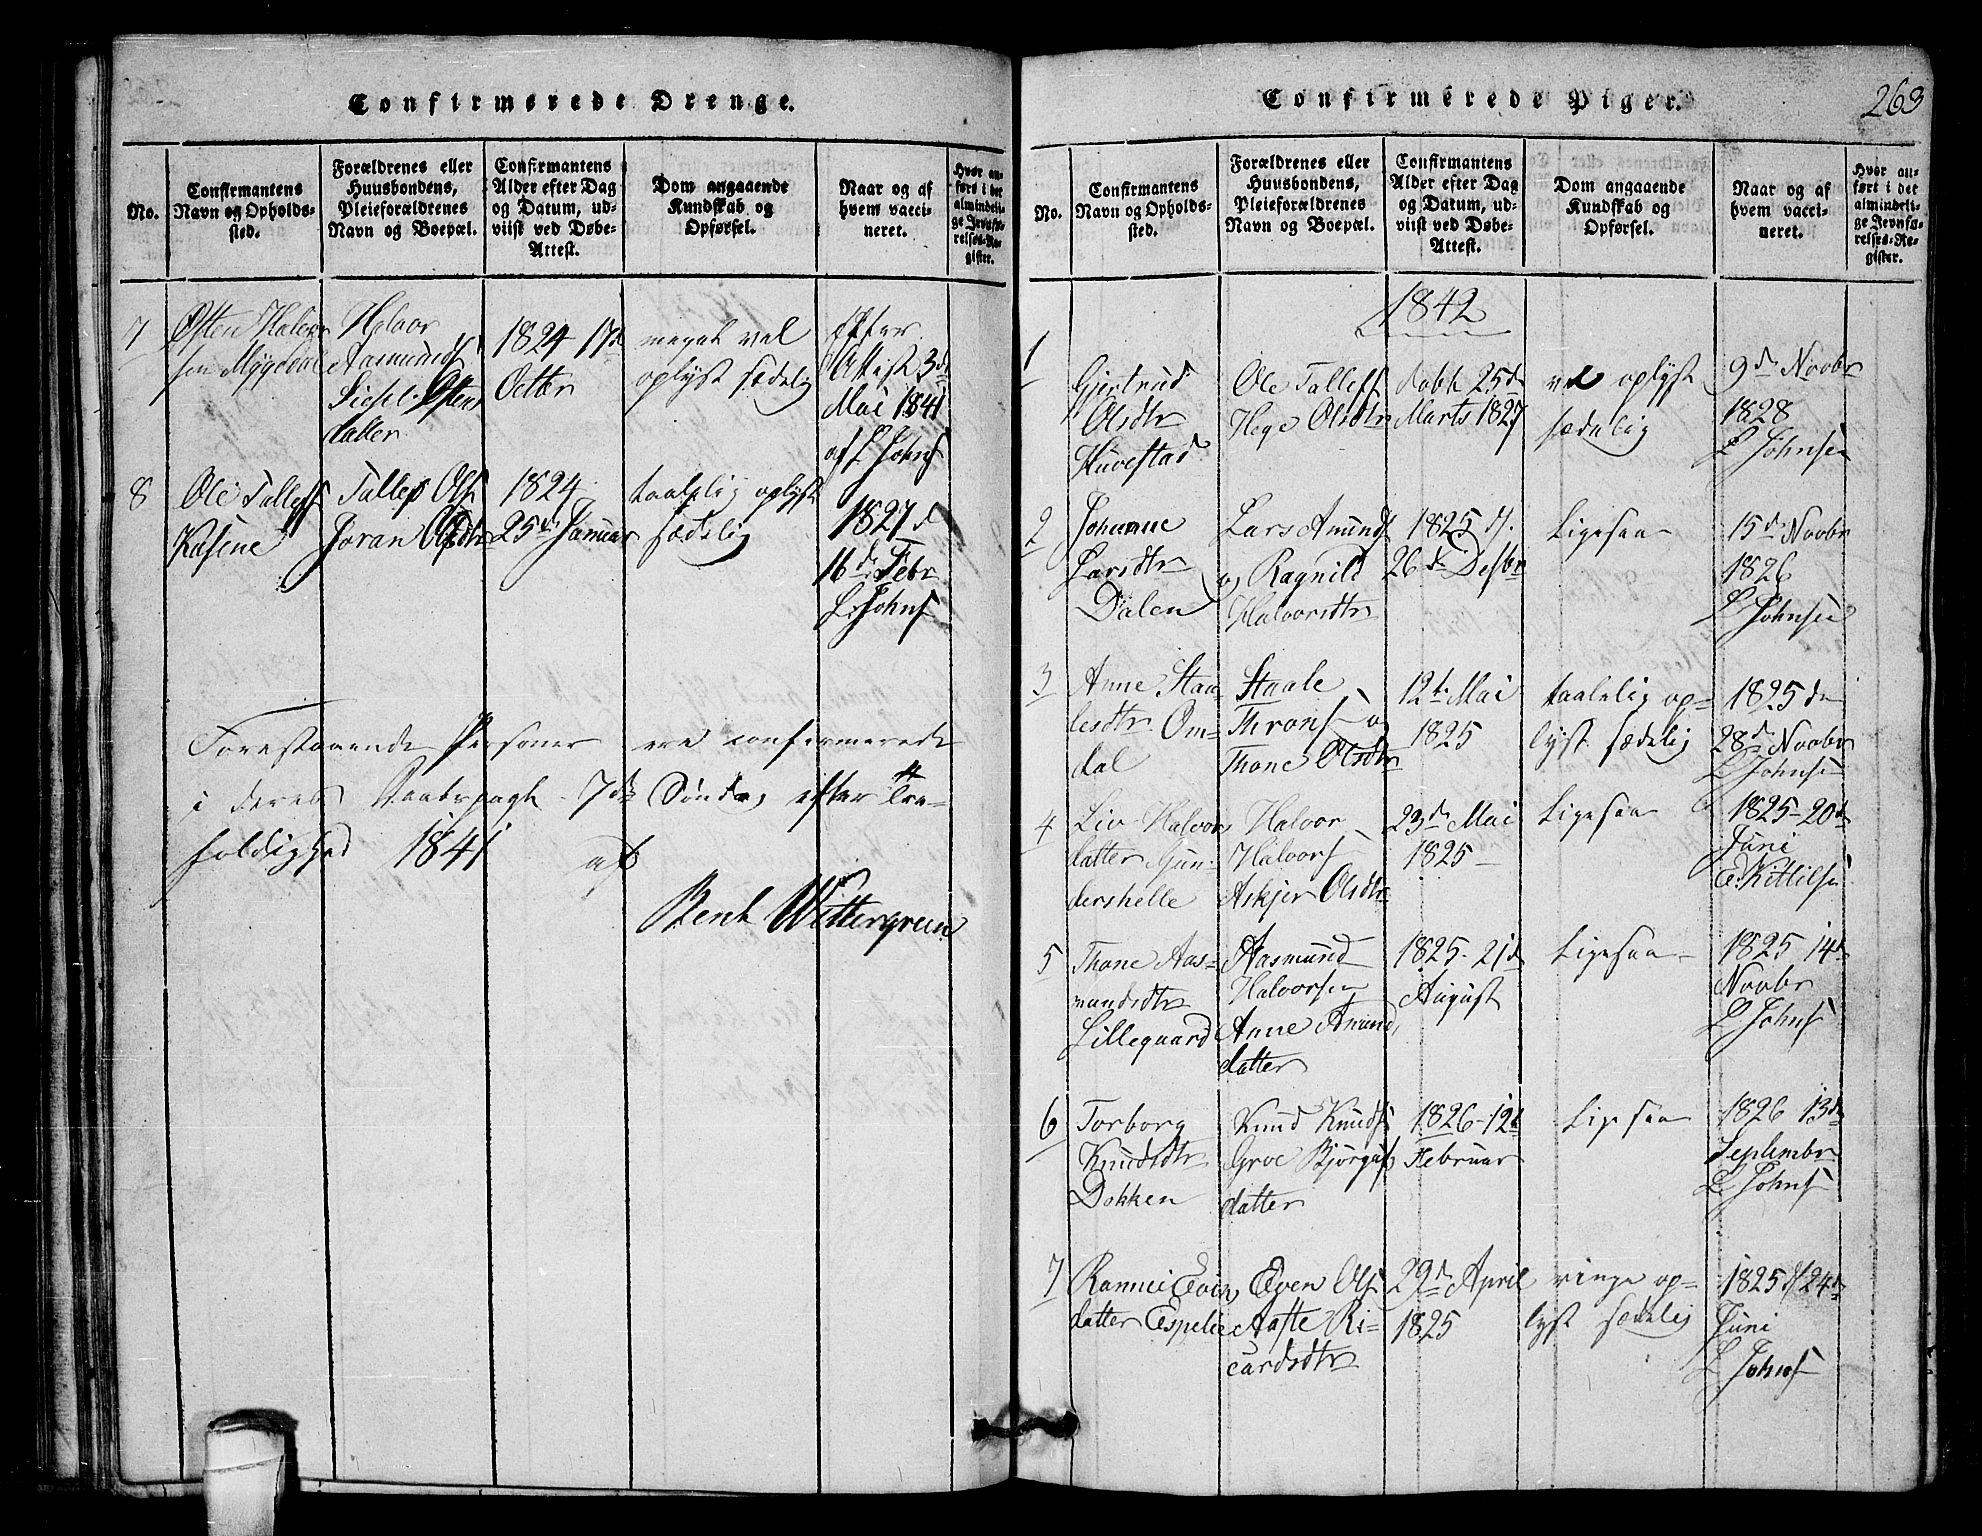 SAKO, Lårdal kirkebøker, G/Gb/L0001: Klokkerbok nr. II 1, 1815-1865, s. 263